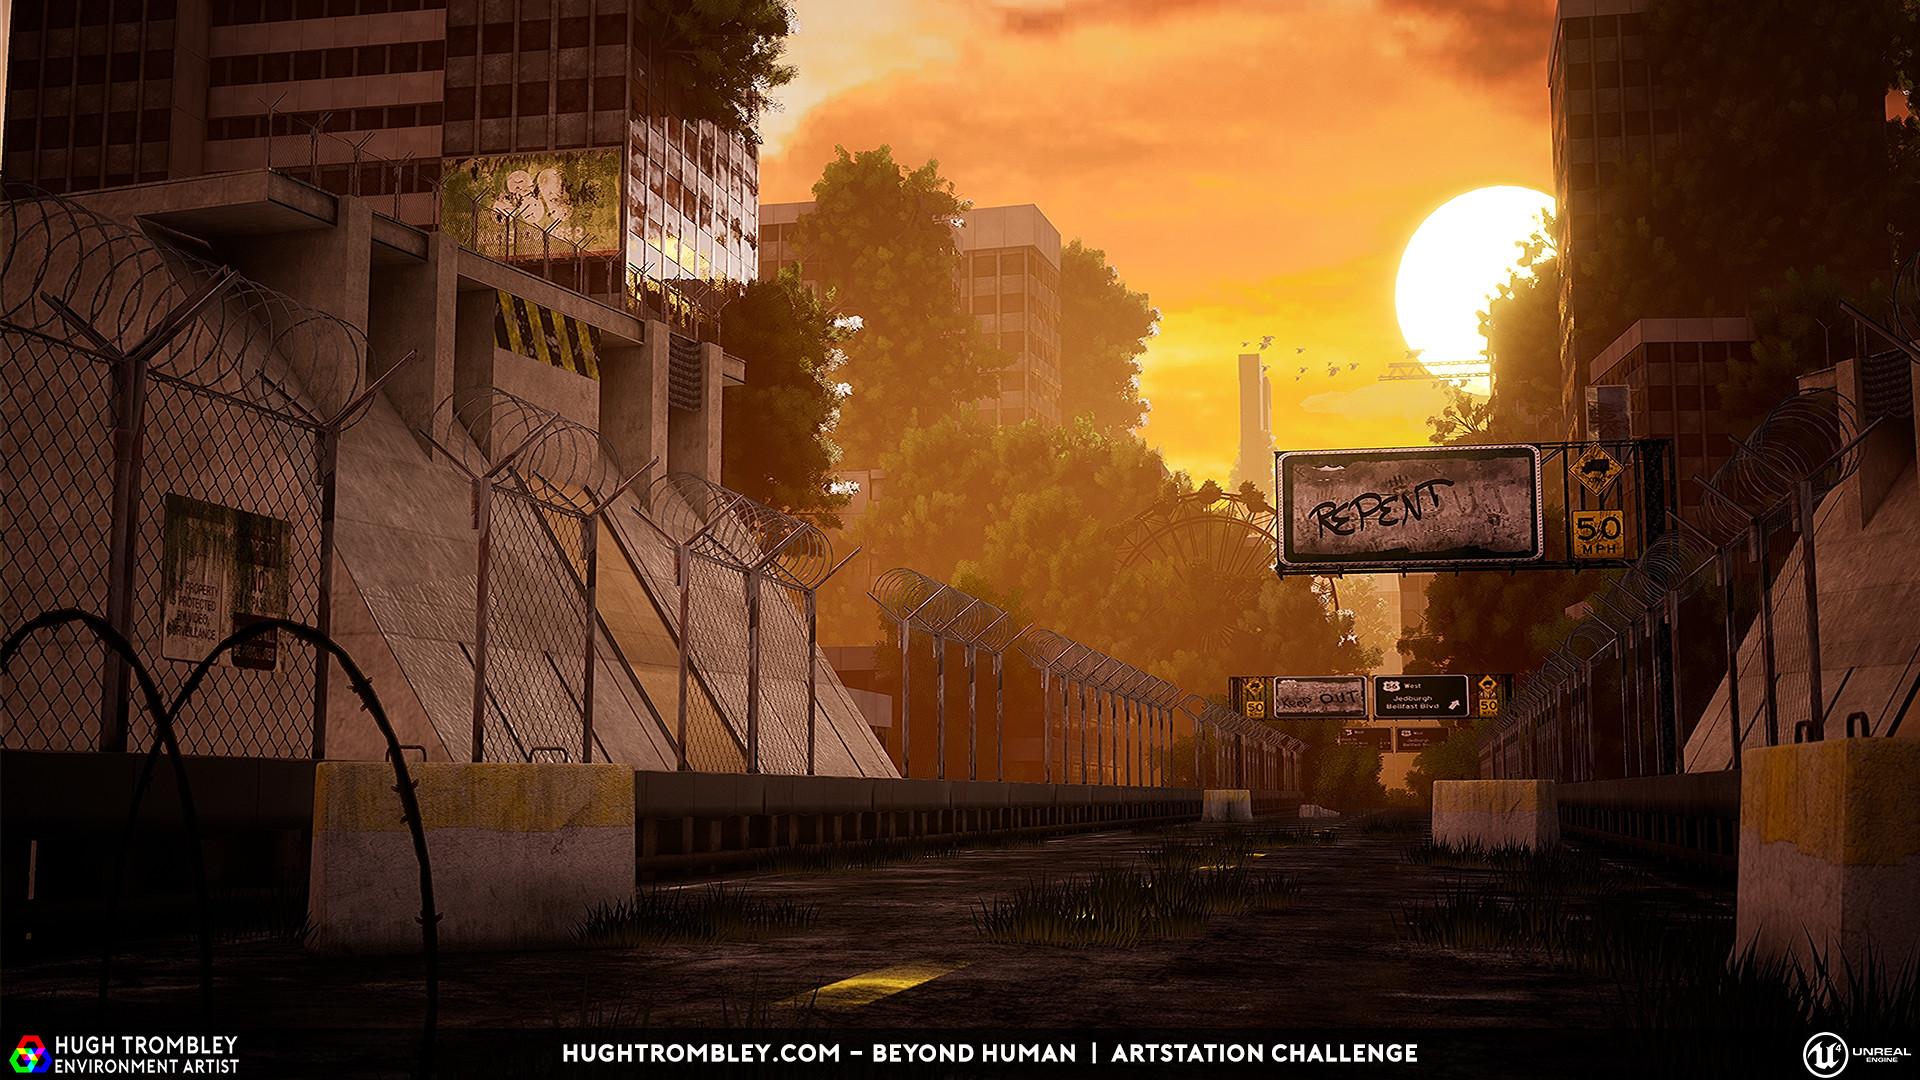 ArtStation - Hugh Trombley's submission on Beyond Human - Game